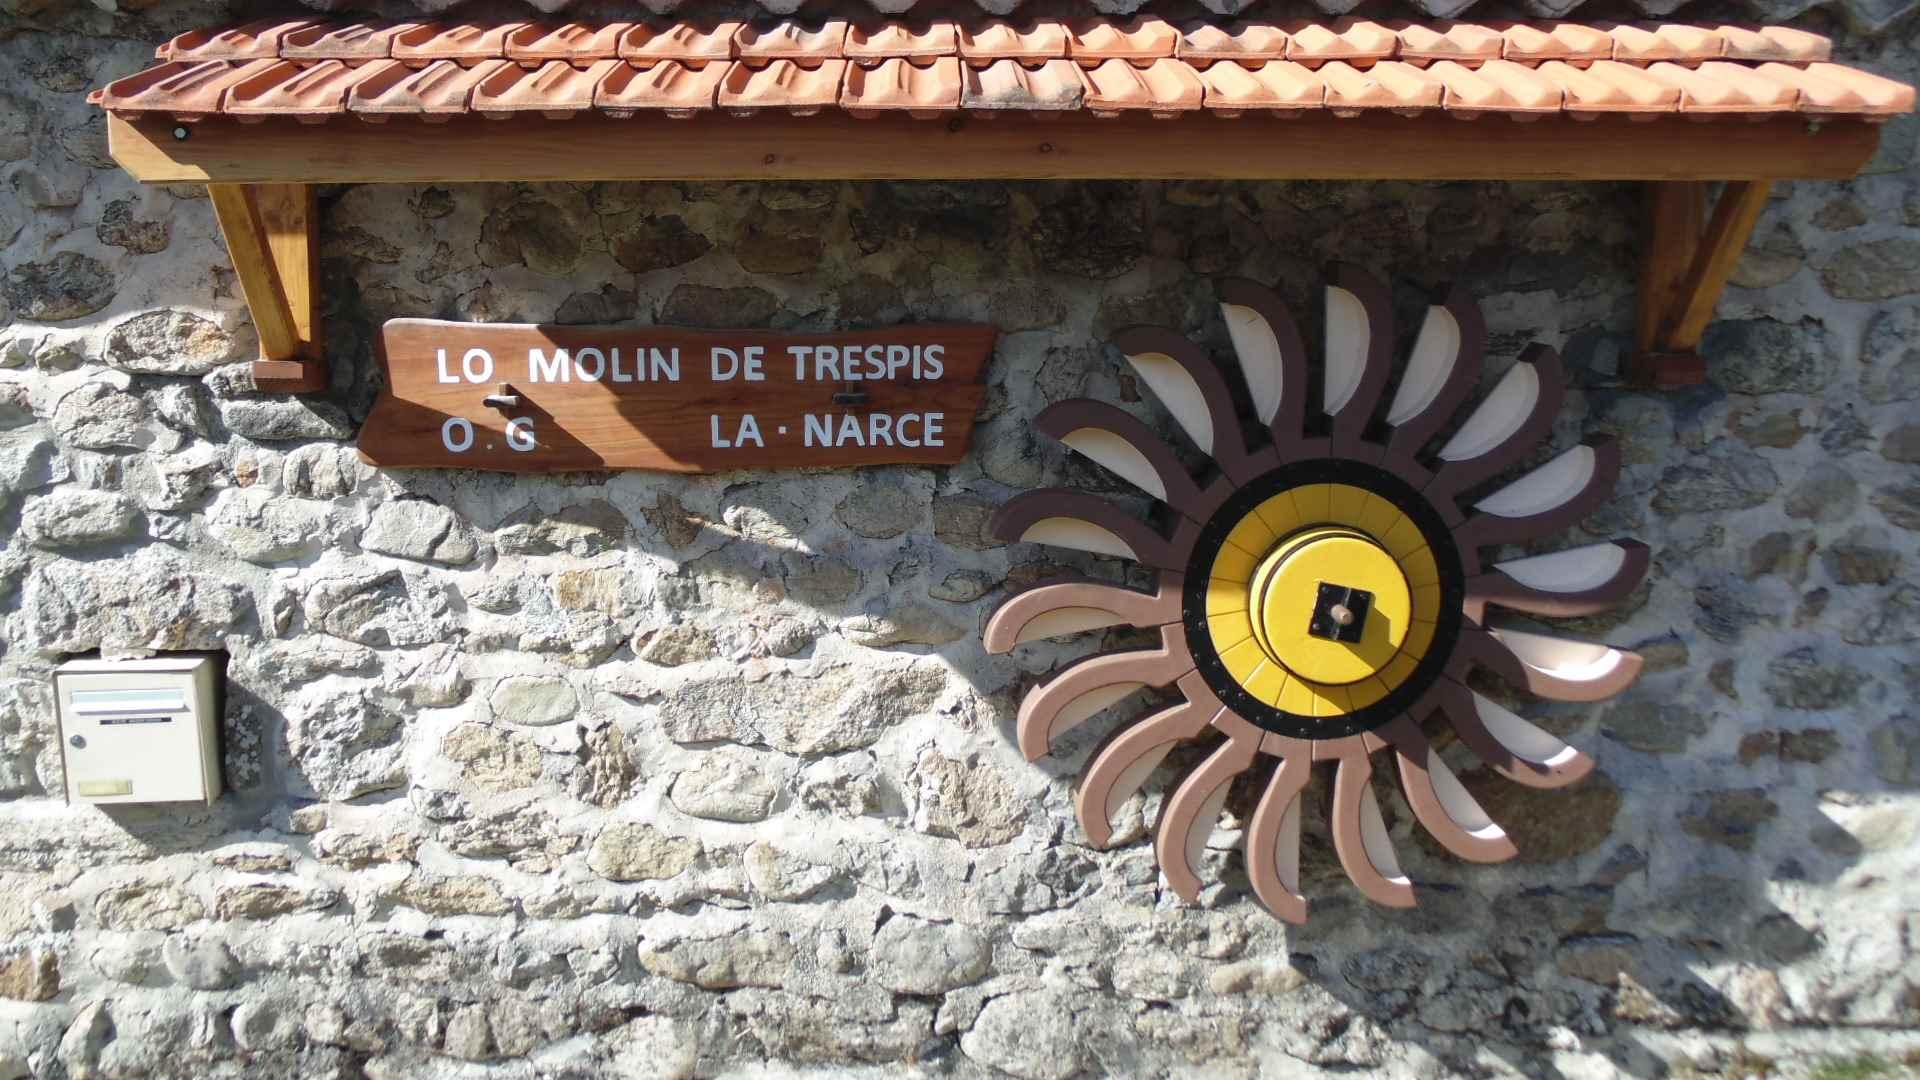 Le Moulin de Trespis